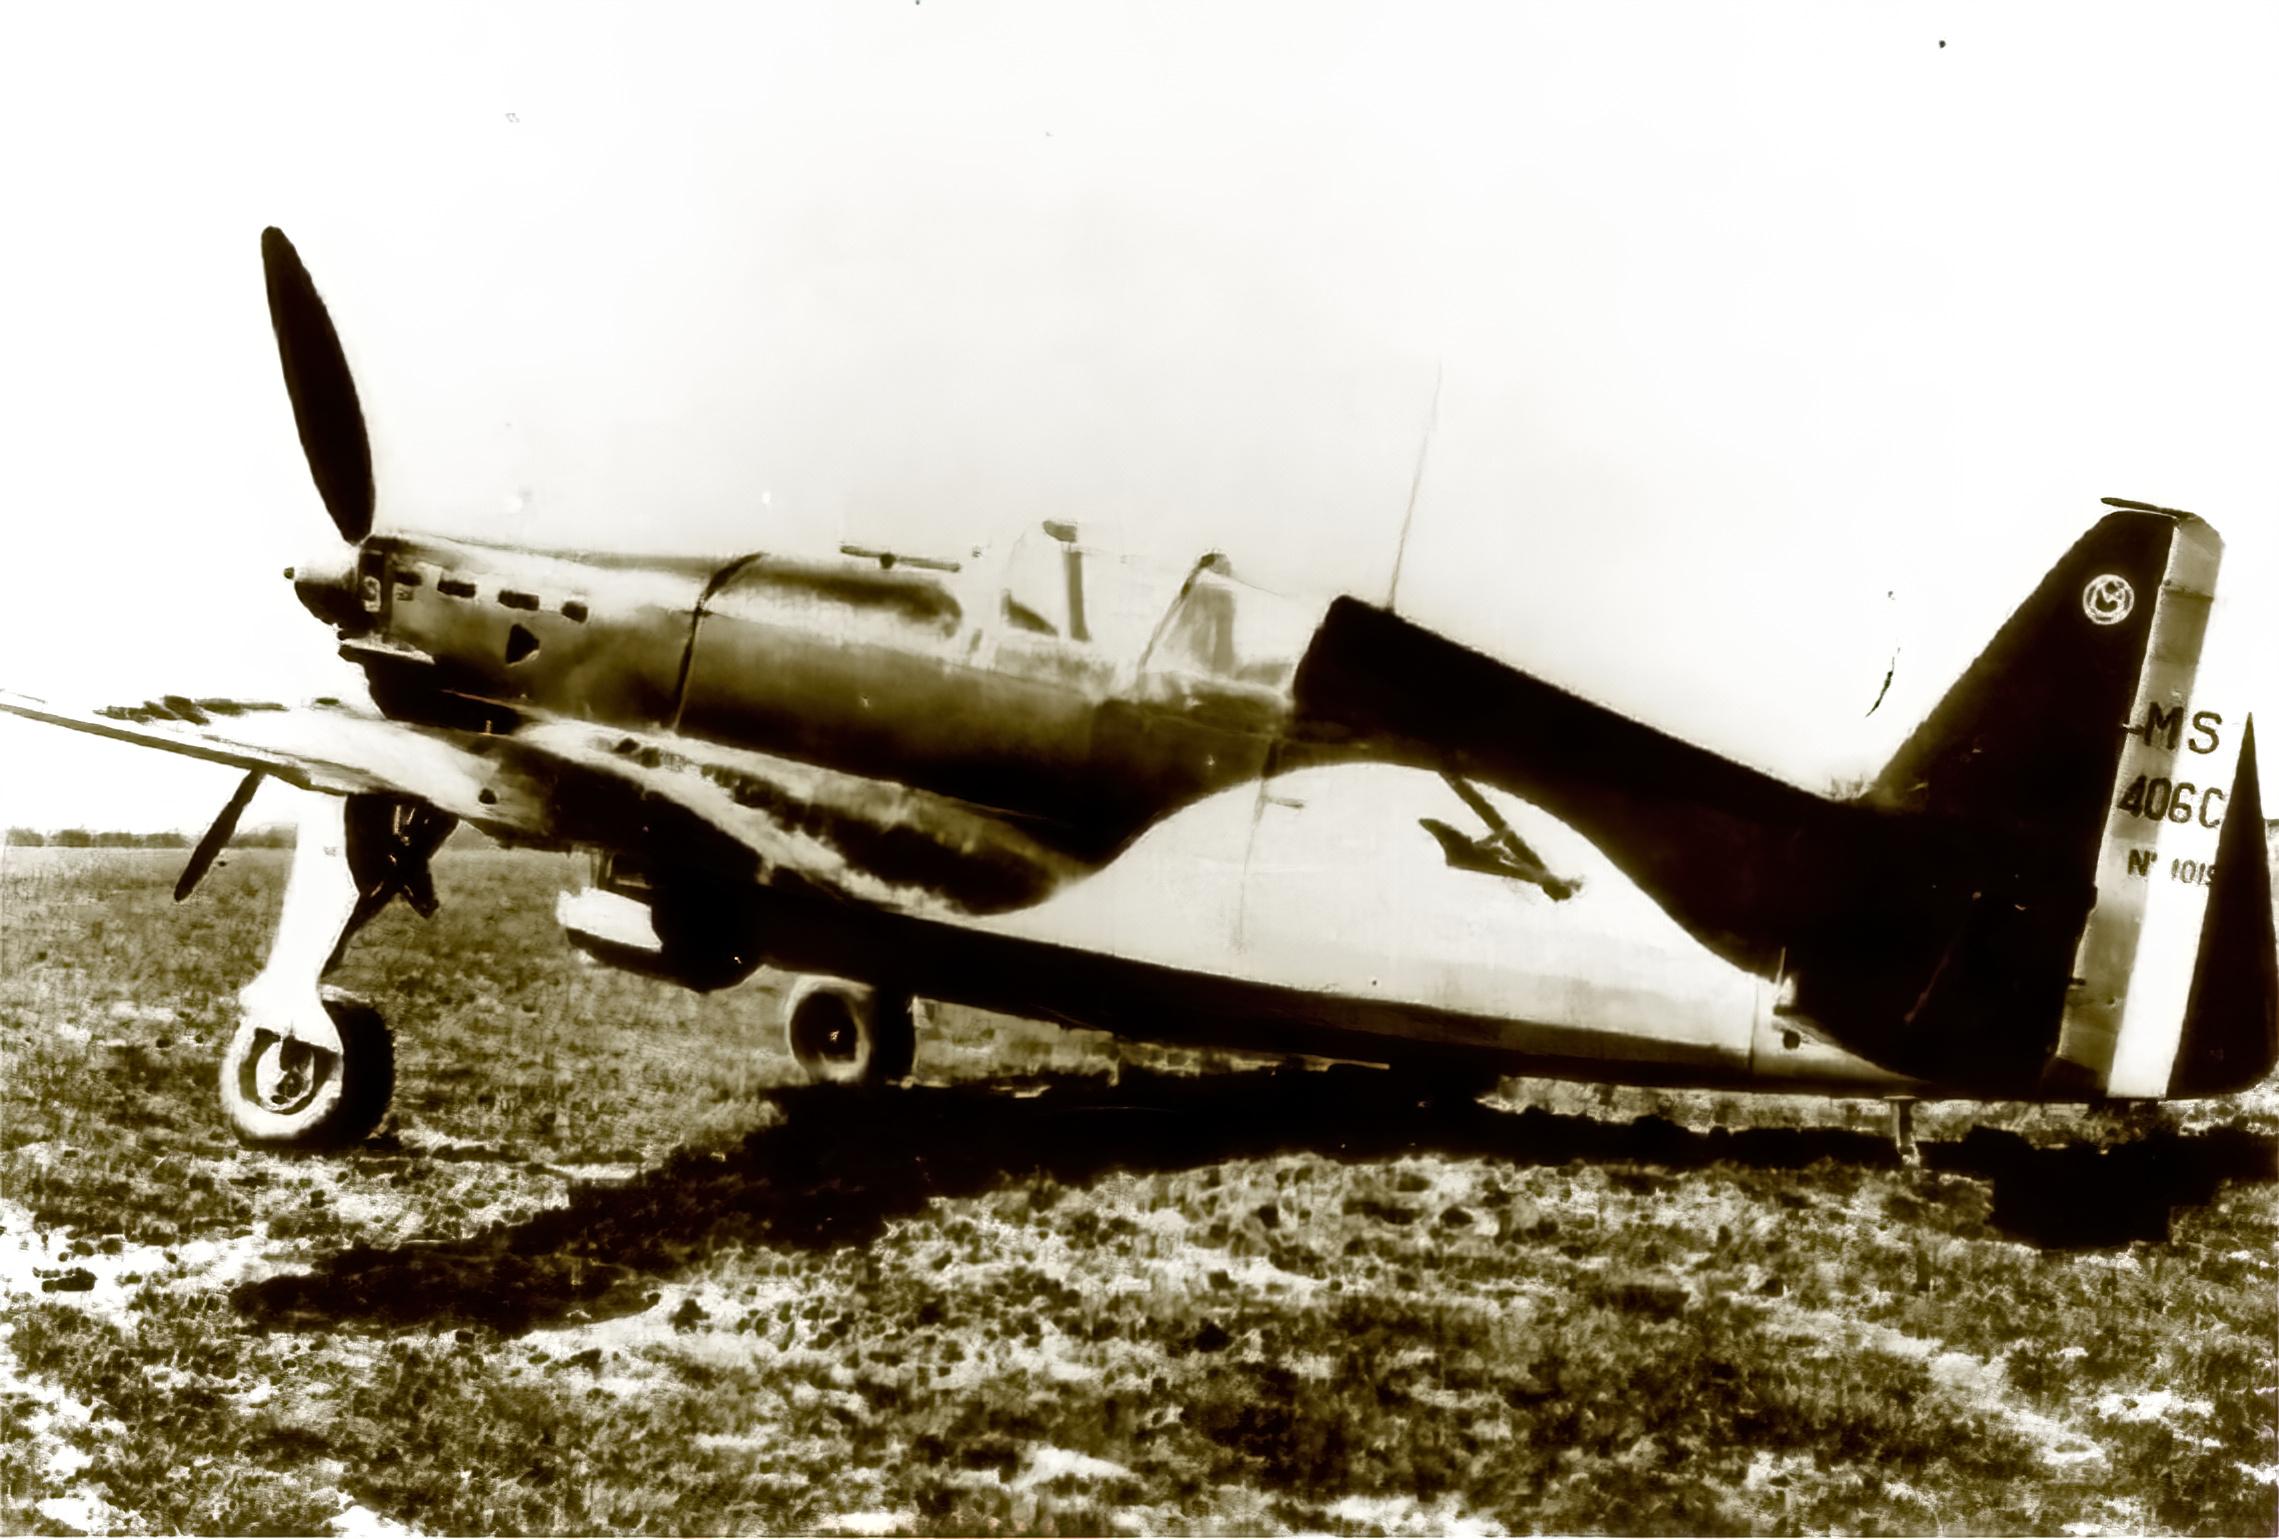 French Airforce Morane Saulnier MS 406C sn1019 mission ready France May Jun 1940 ebay 01